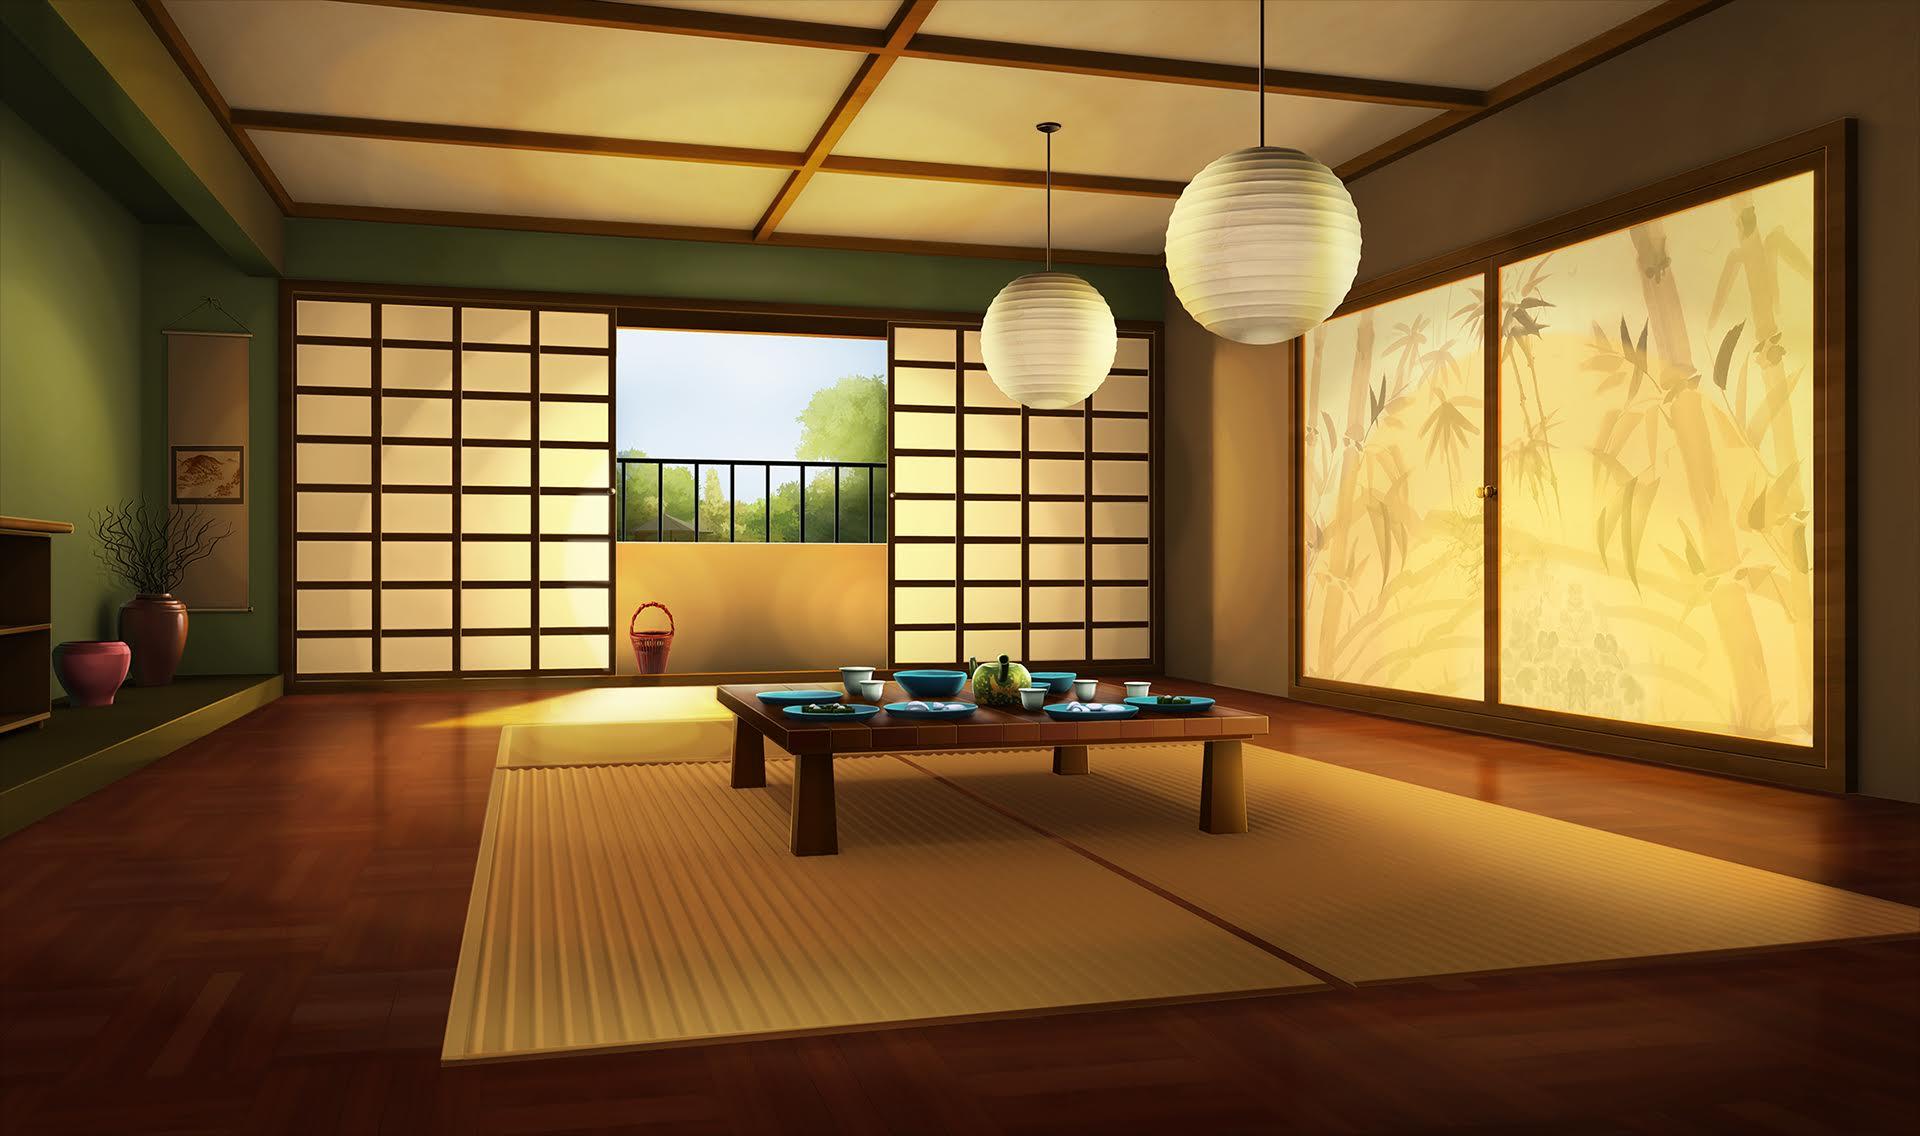 Japanese tea house interior - House interior pic ...